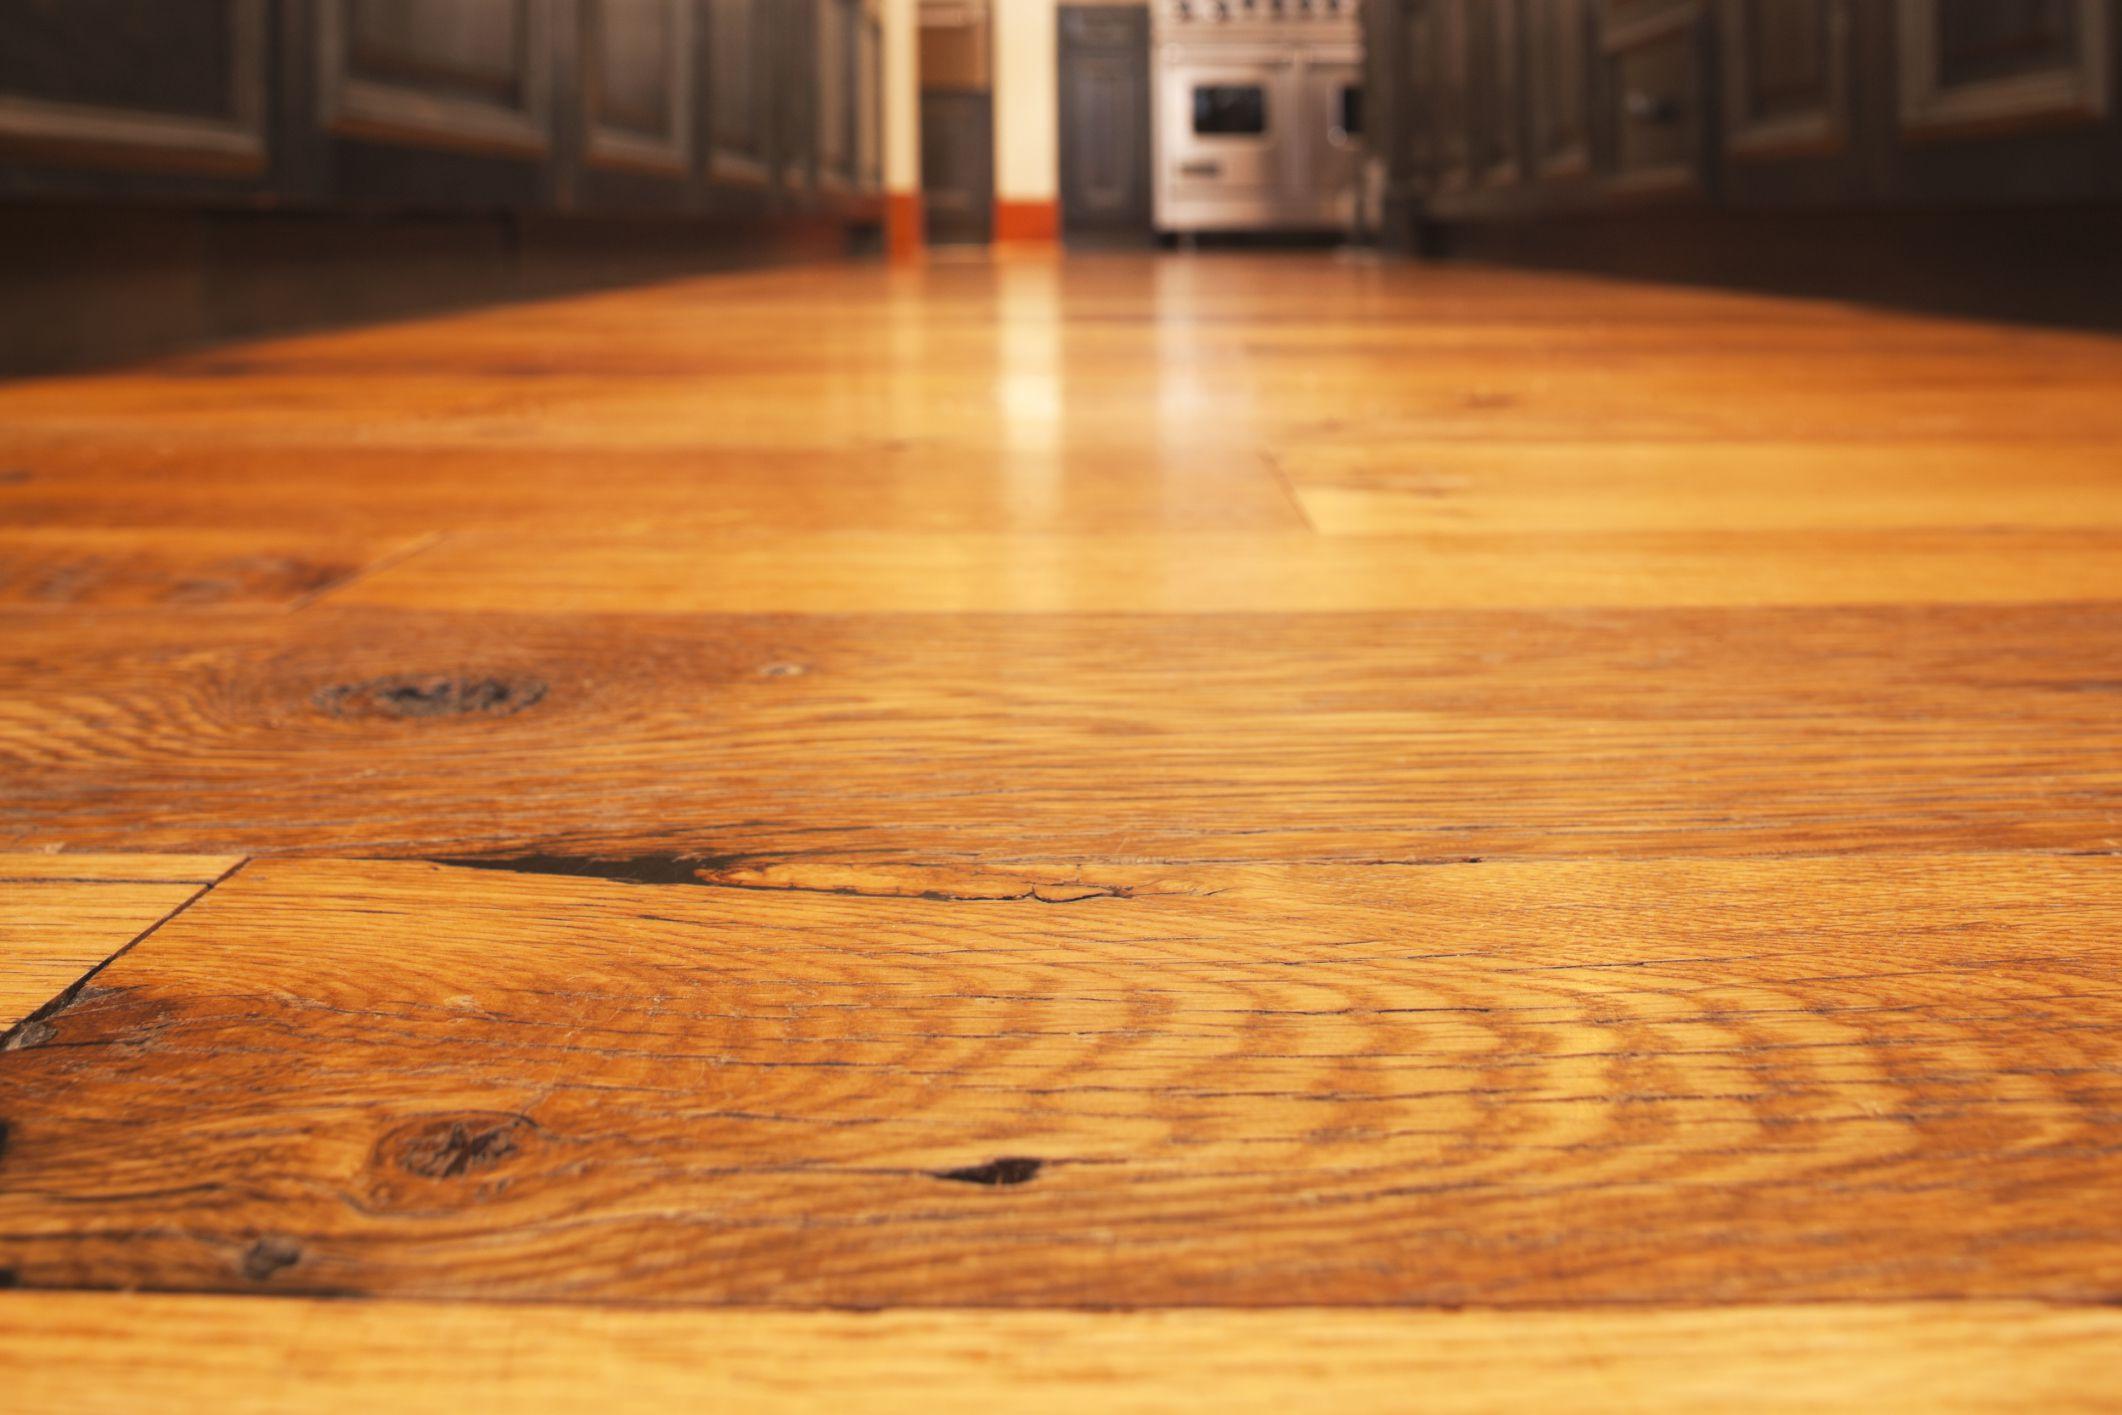 unfinished walnut hardwood flooring of why a microbevel is on your flooring inside wood floor closeup microbevel 56a4a13f5f9b58b7d0d7e5f4